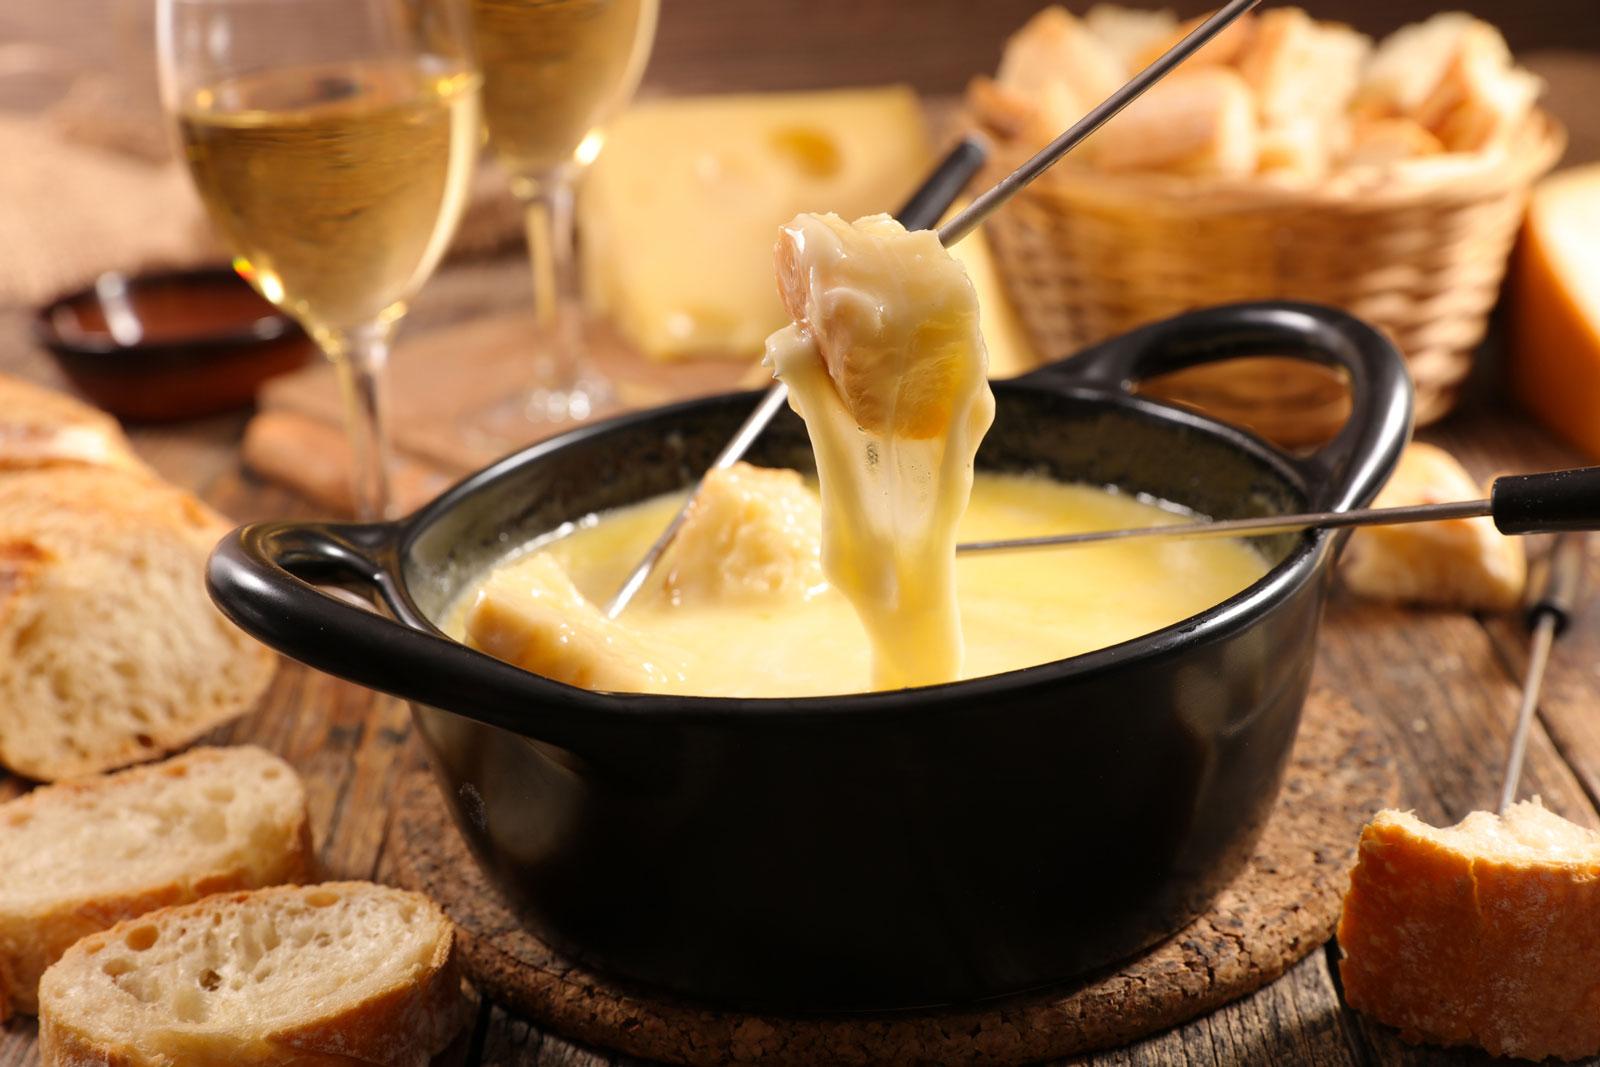 Alternative zum Weihnachtsbraten: Käsefondue